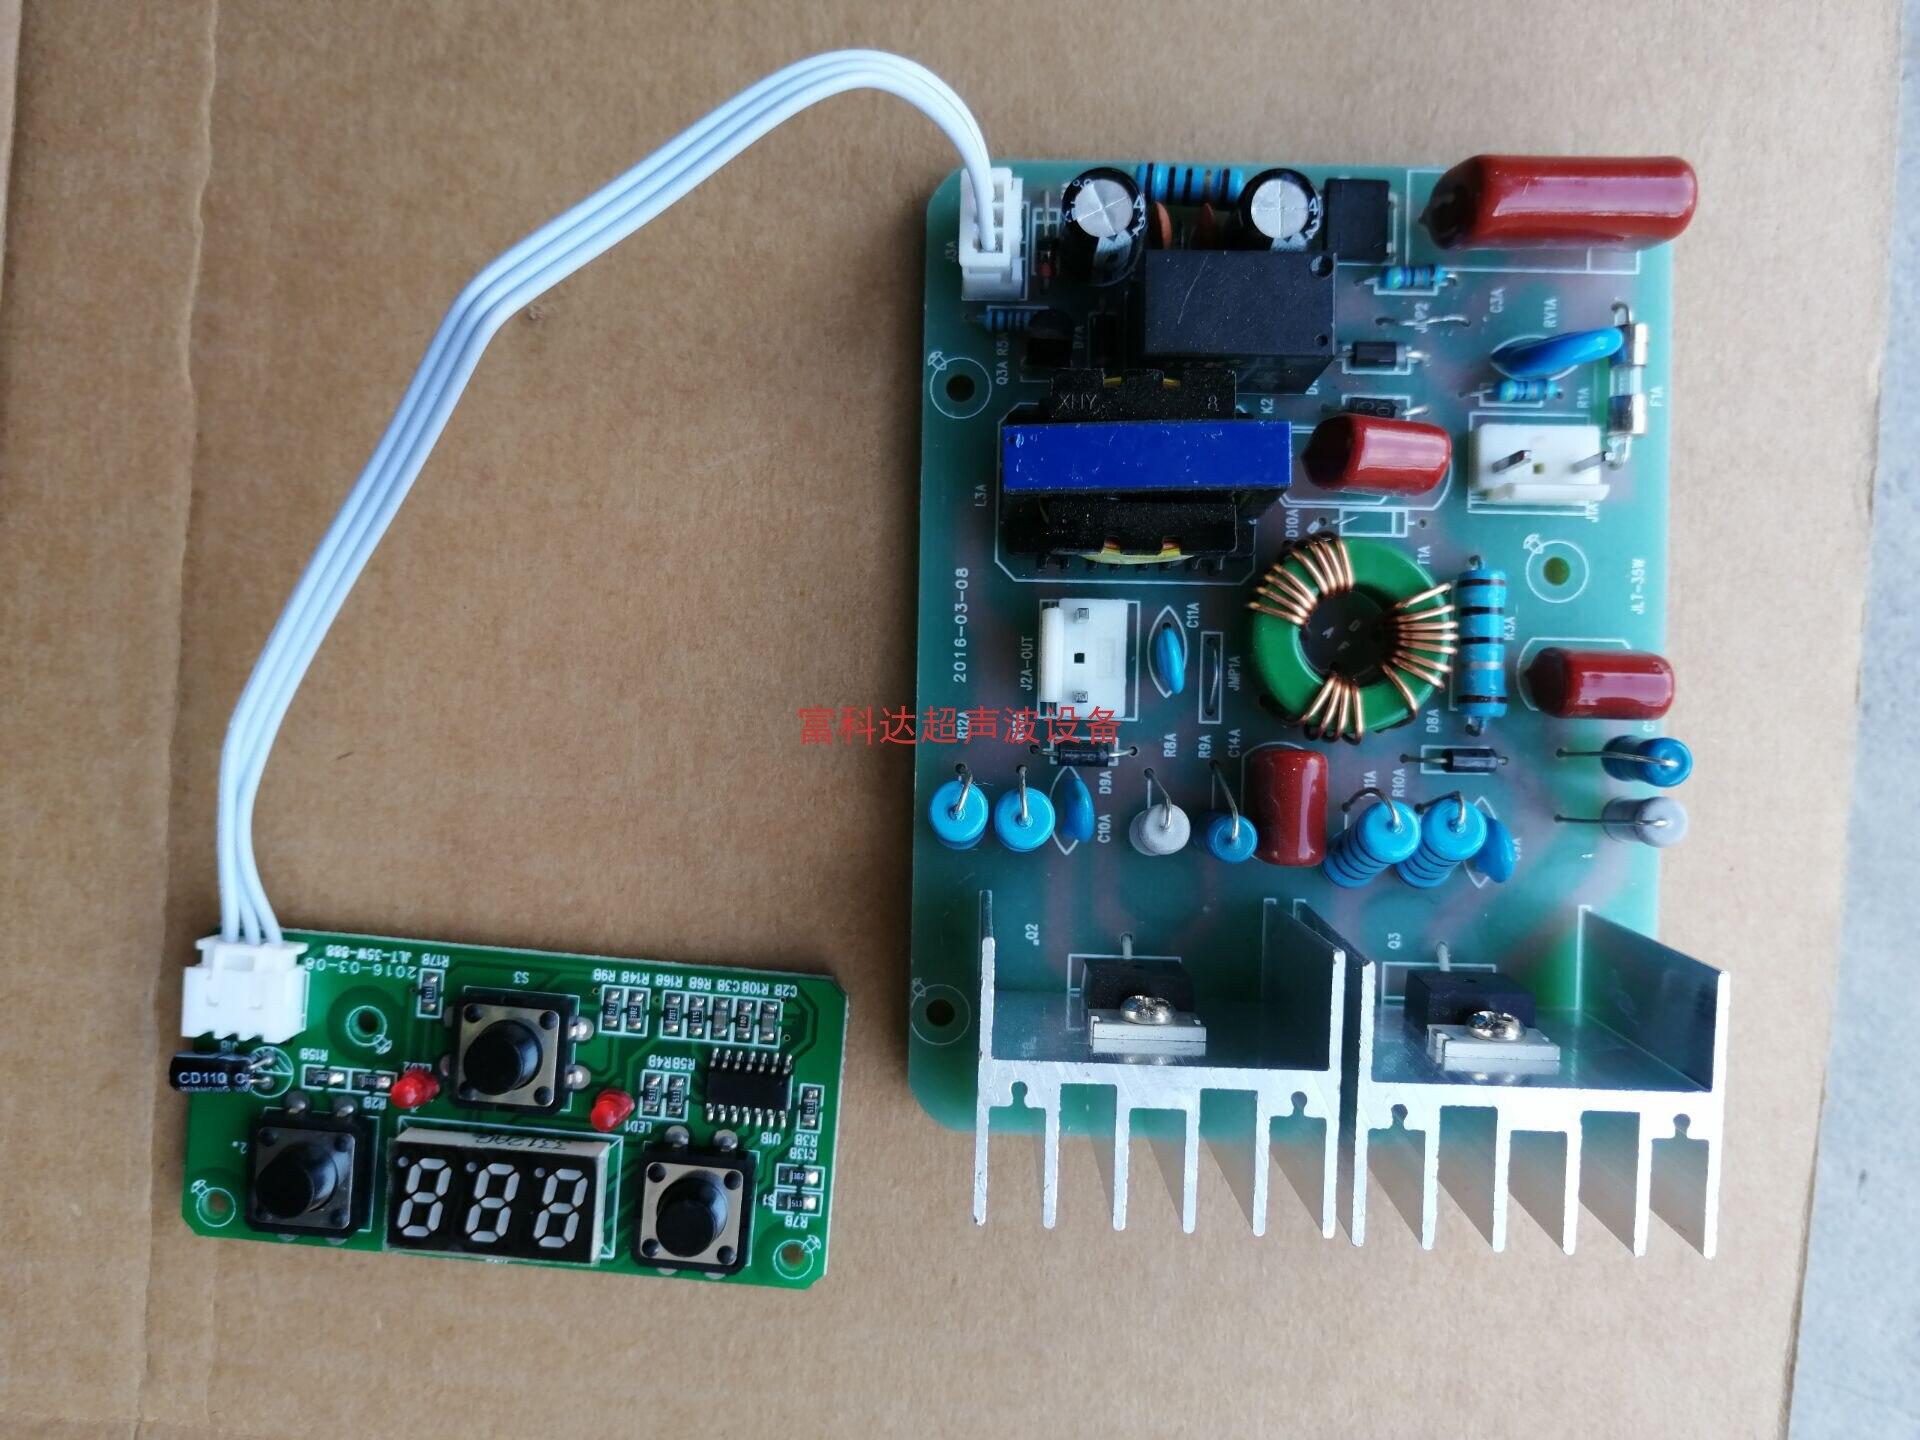 43K35W Ultrasonic Cleaning Machine Transducer Control Generator 40K42K50W Ultrasonic Ceramic Chip Power Supply